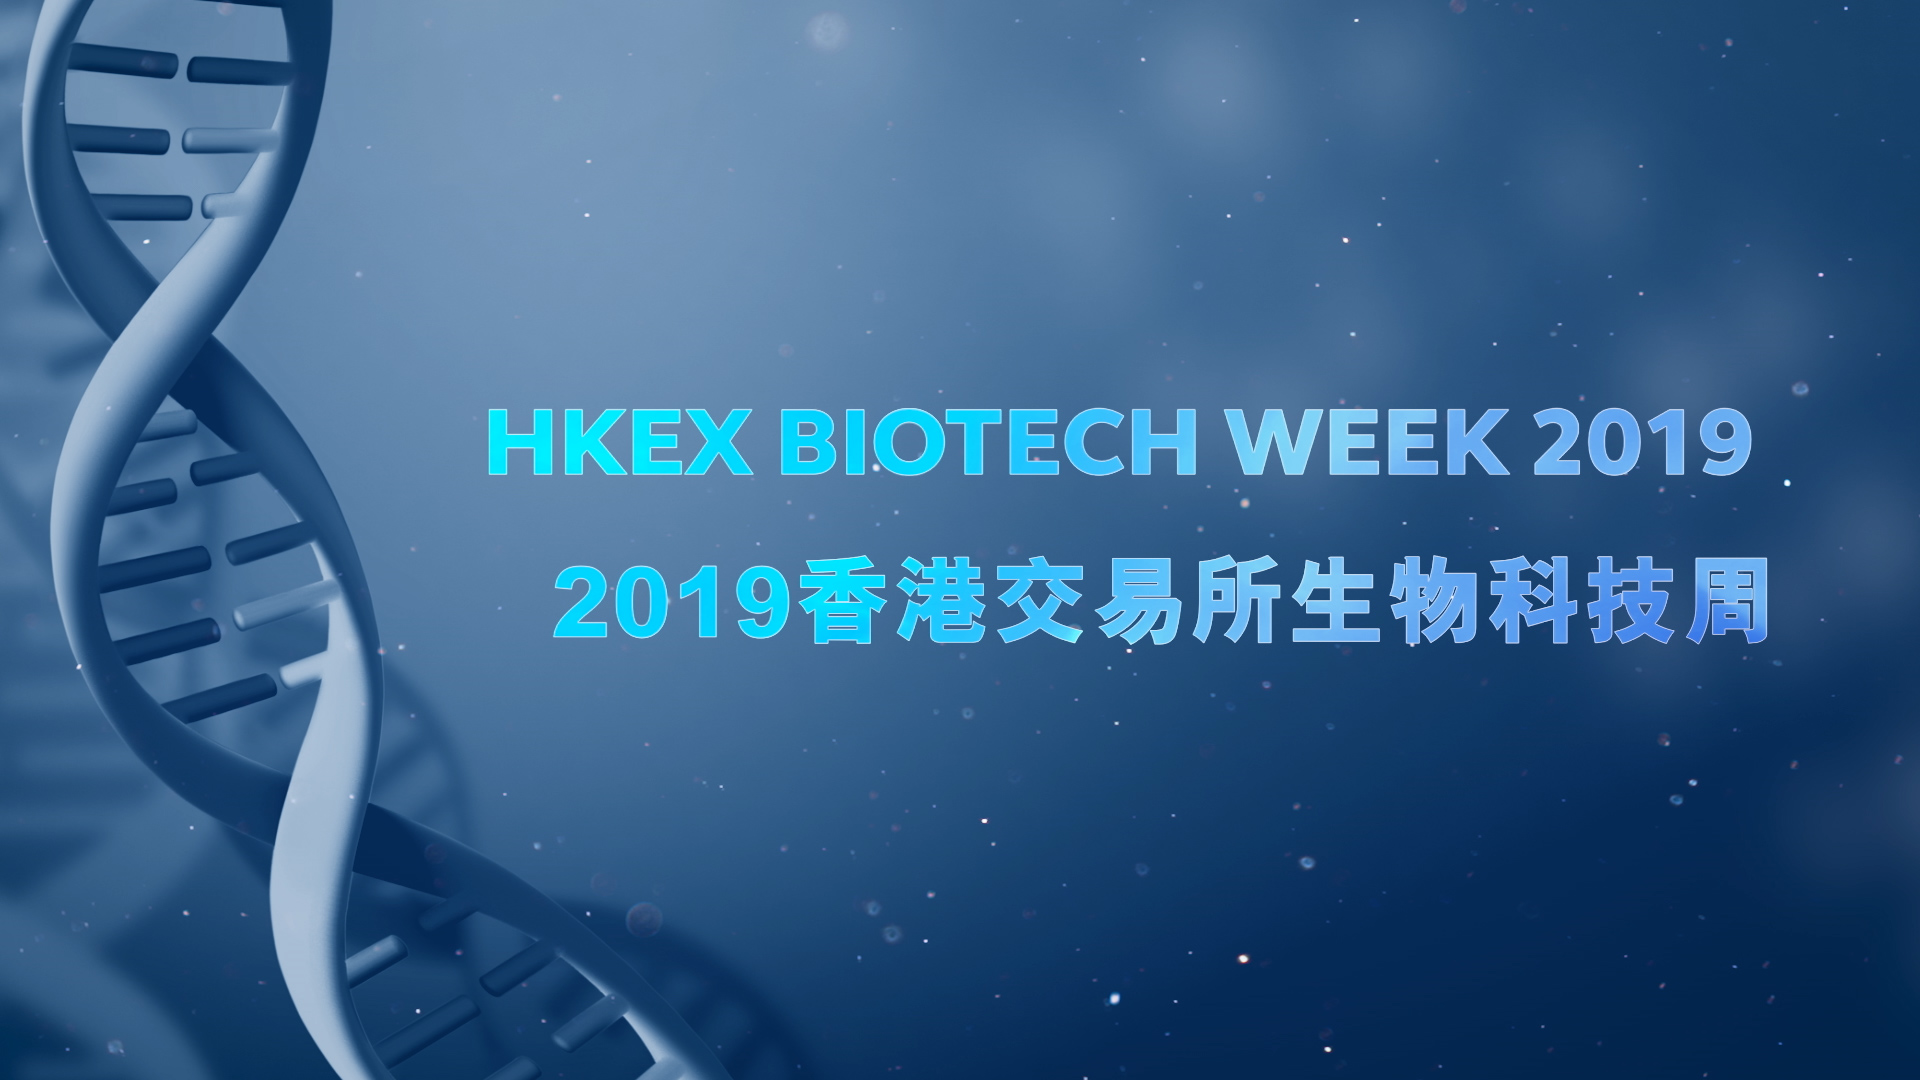 HKEX Biotech Week